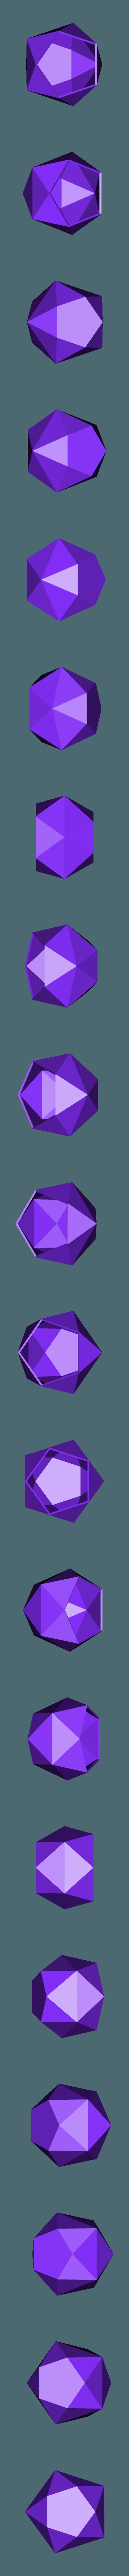 GEOMETRIC VASE.stl Download STL file Geometric Vase • 3D printable object, BUGA